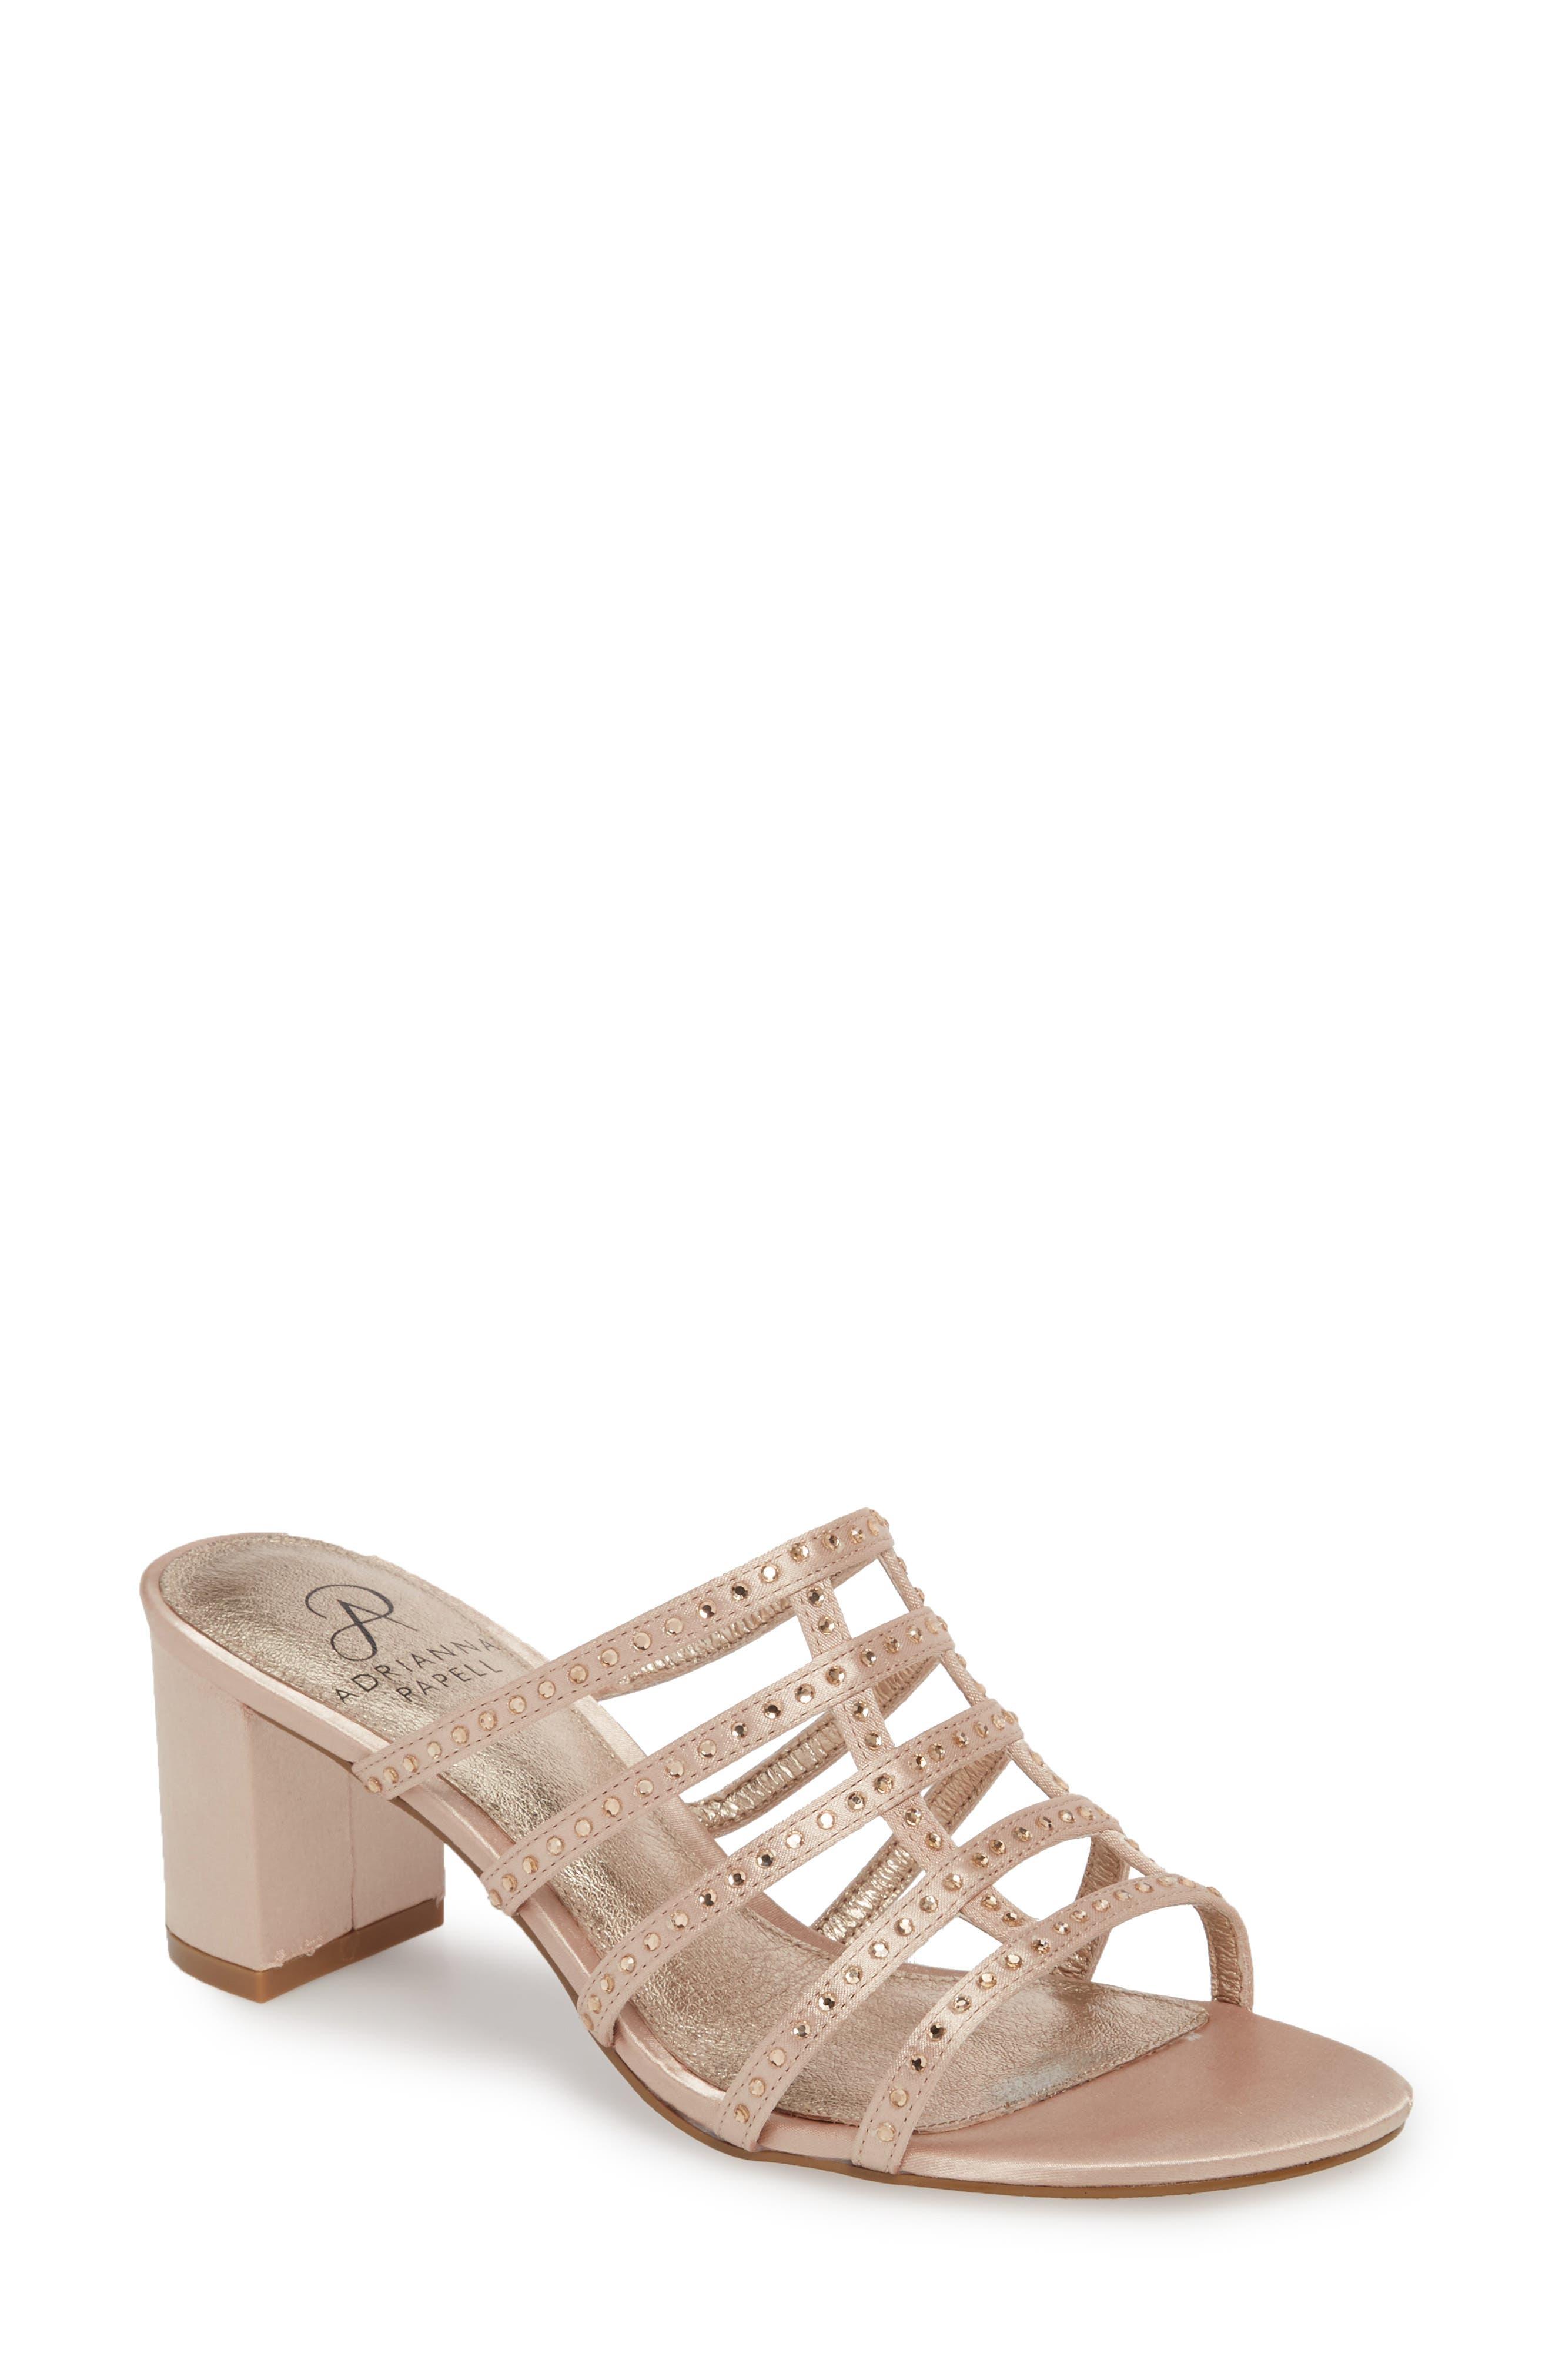 Apollo Block Heel Sandal,                             Main thumbnail 1, color,                             Sheer Fabric